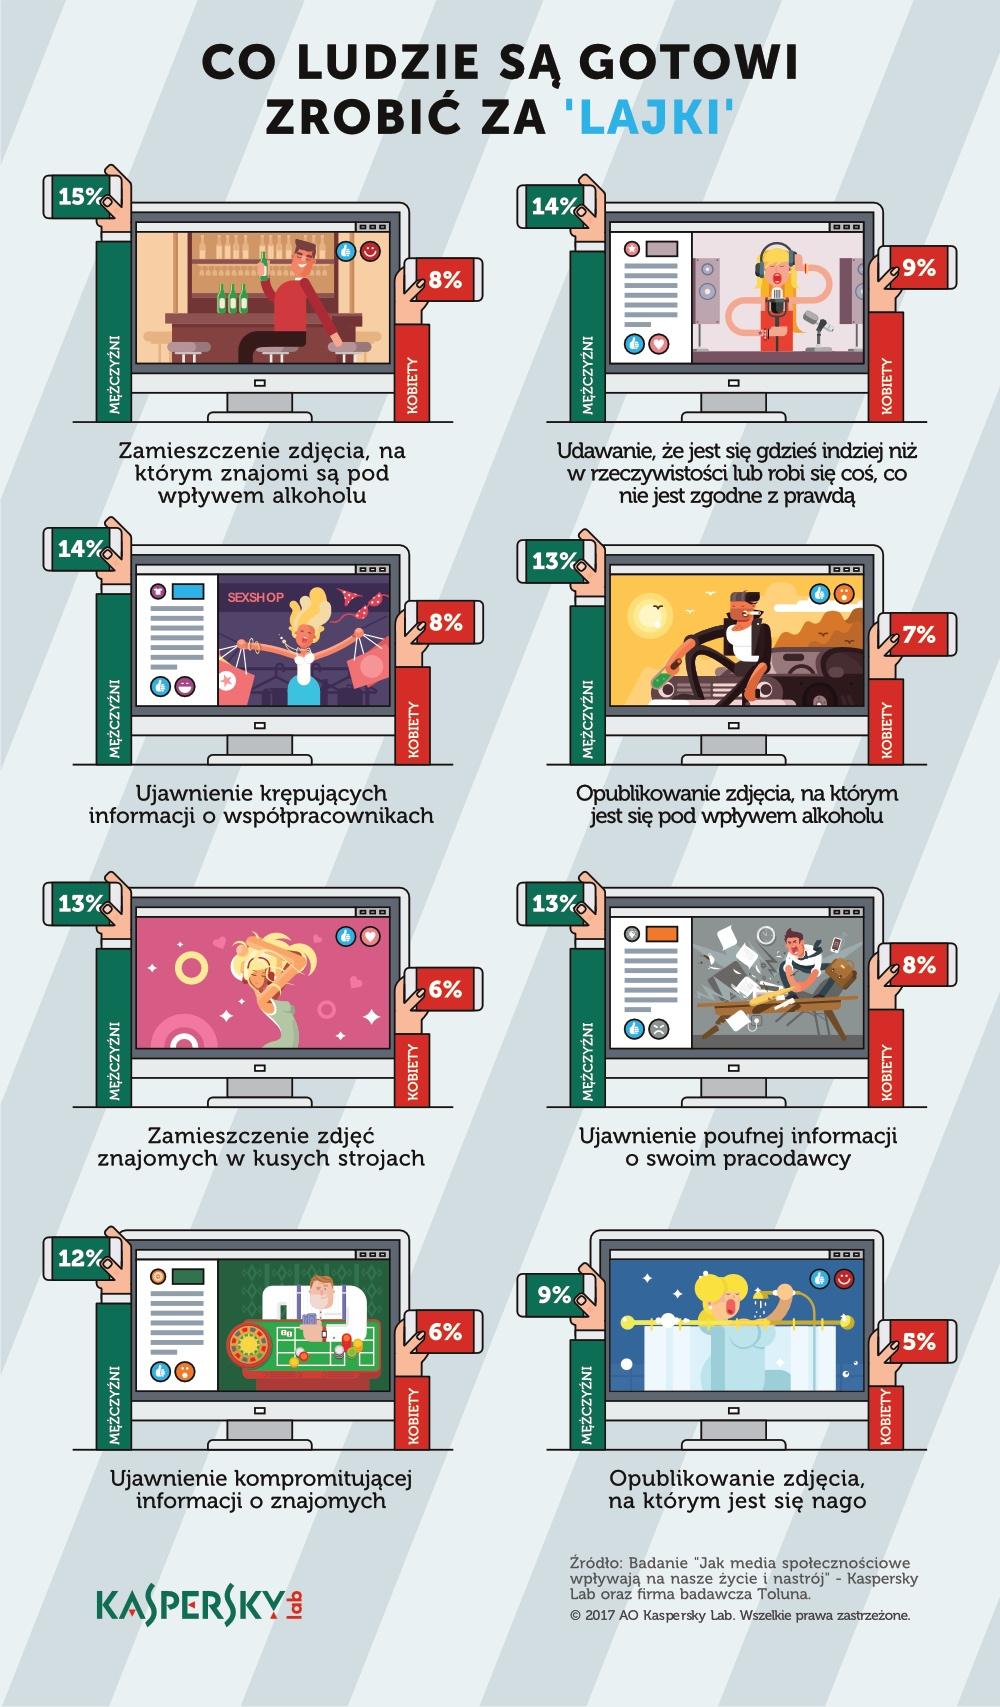 klp_infografika_co_robimy_za_lajki